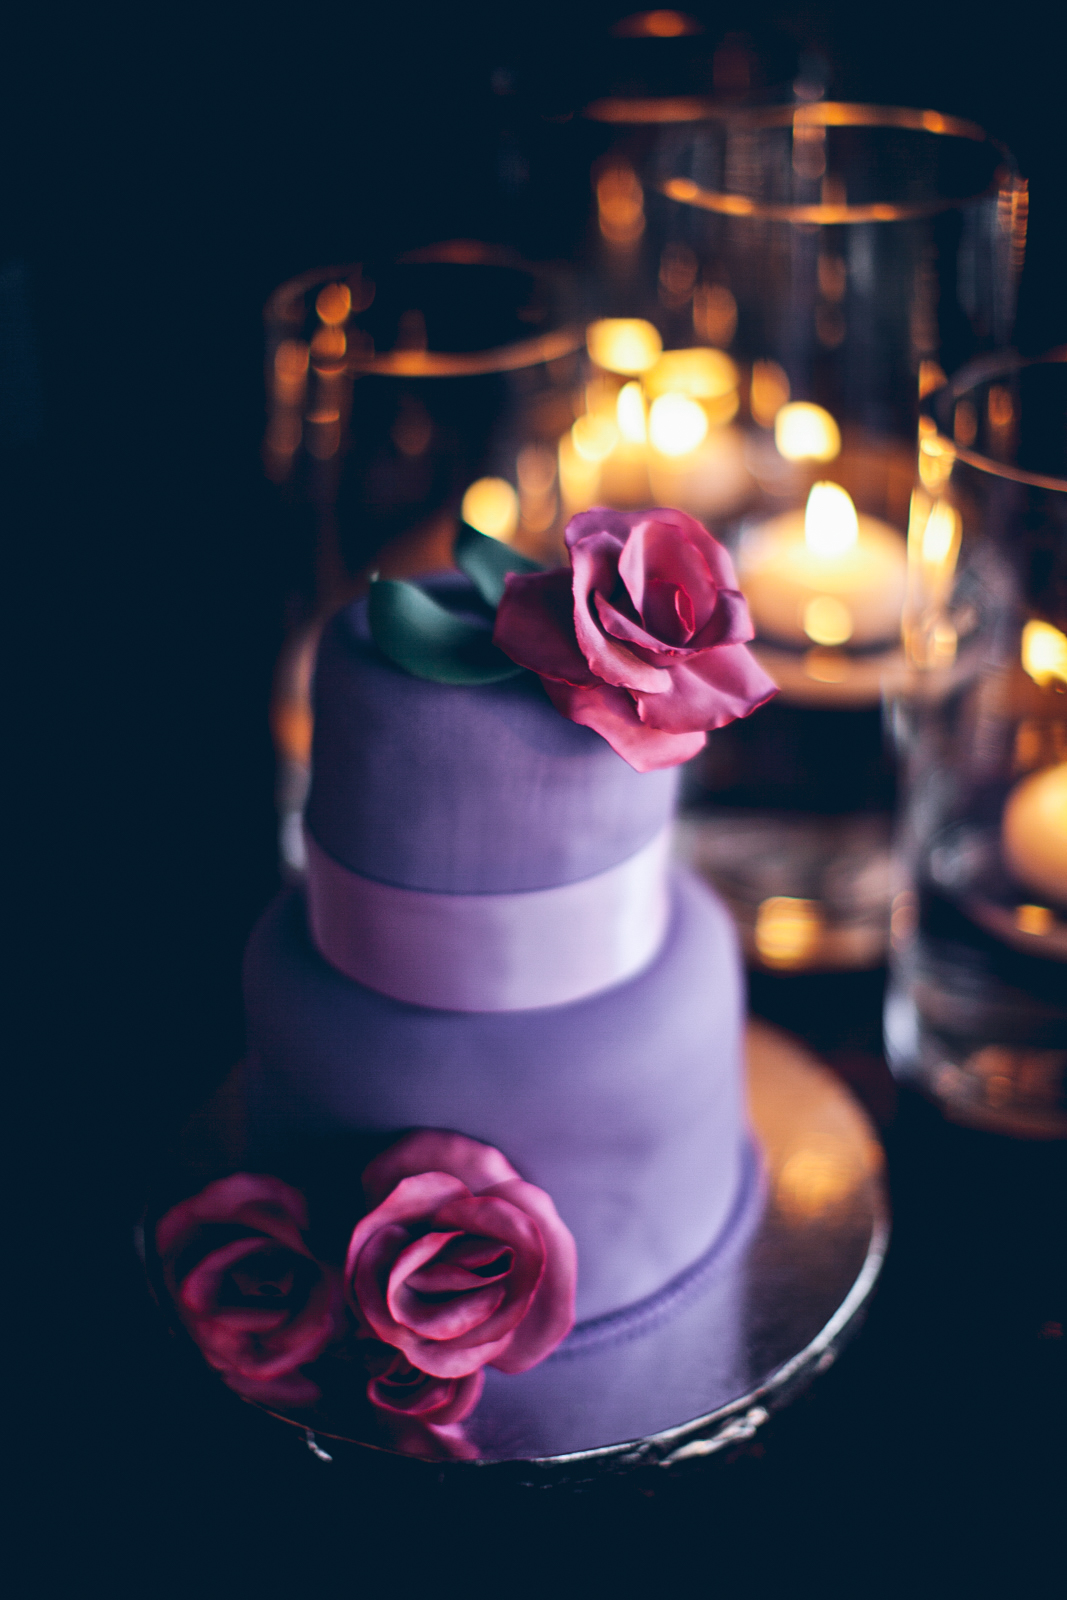 greens_restaurant_wedding_photography_san_franscisco_ebony_siovhan_bokeh_photography_66.jpg